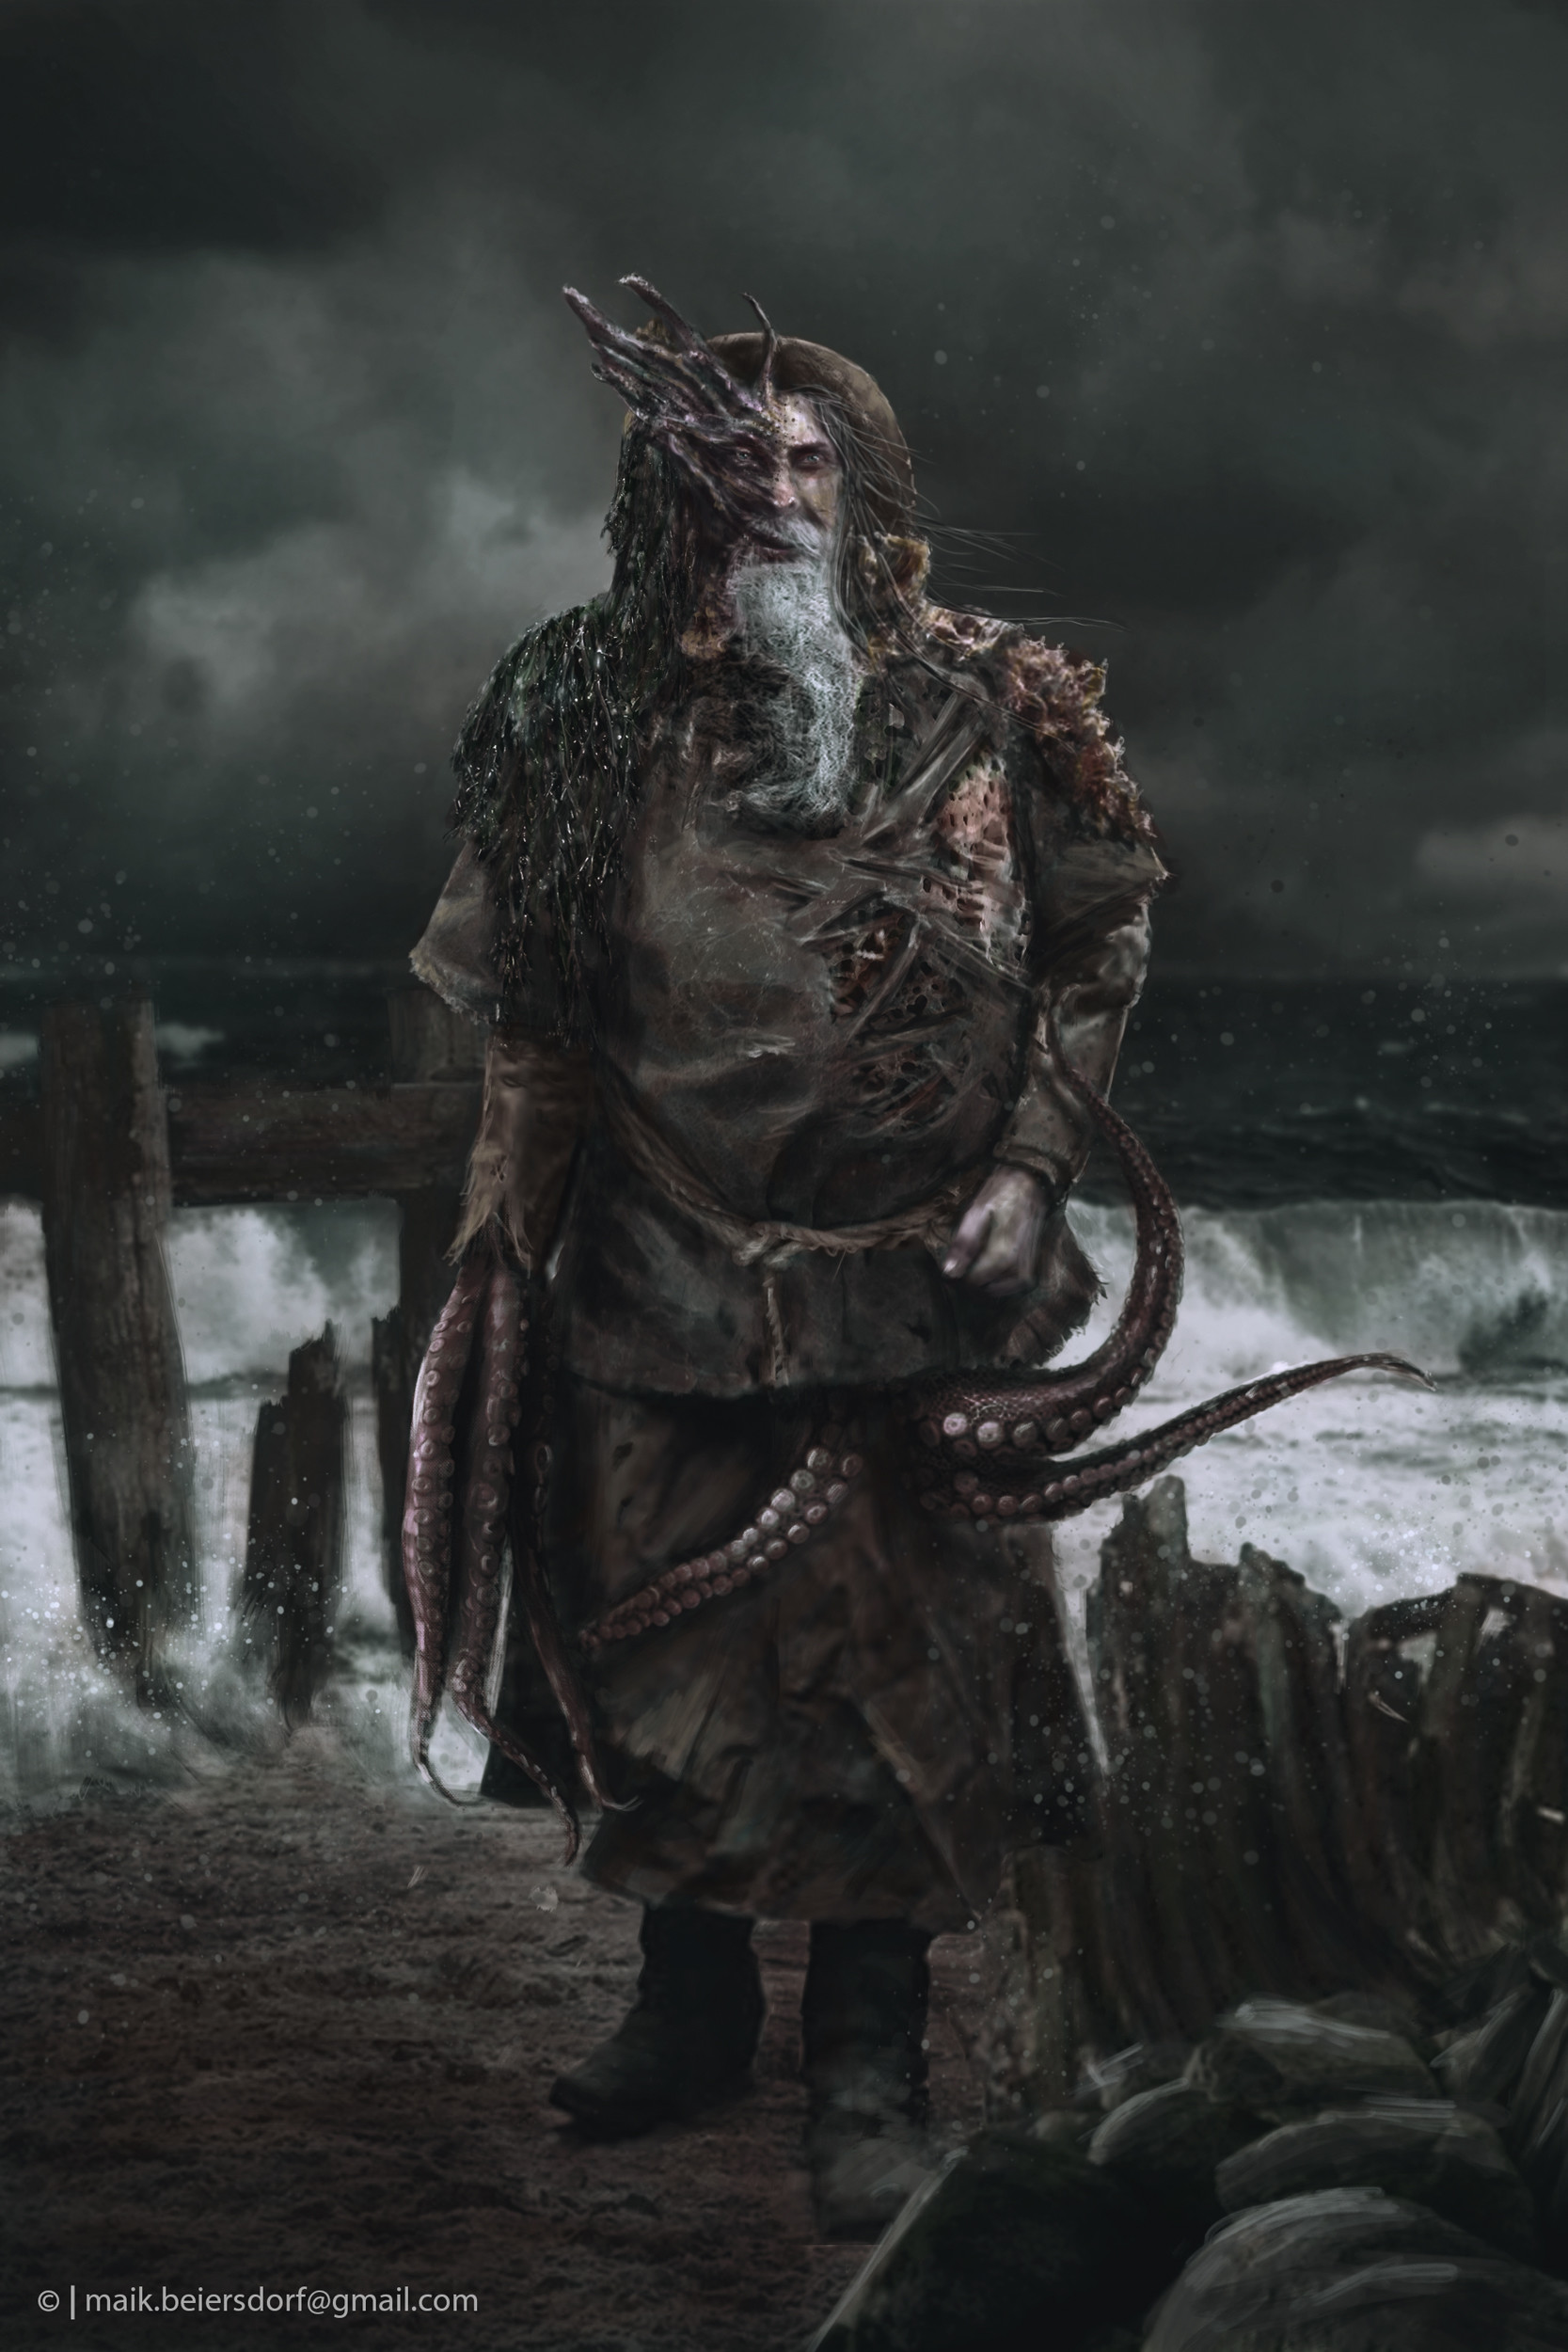 Maik beiersdorf fisherman v2